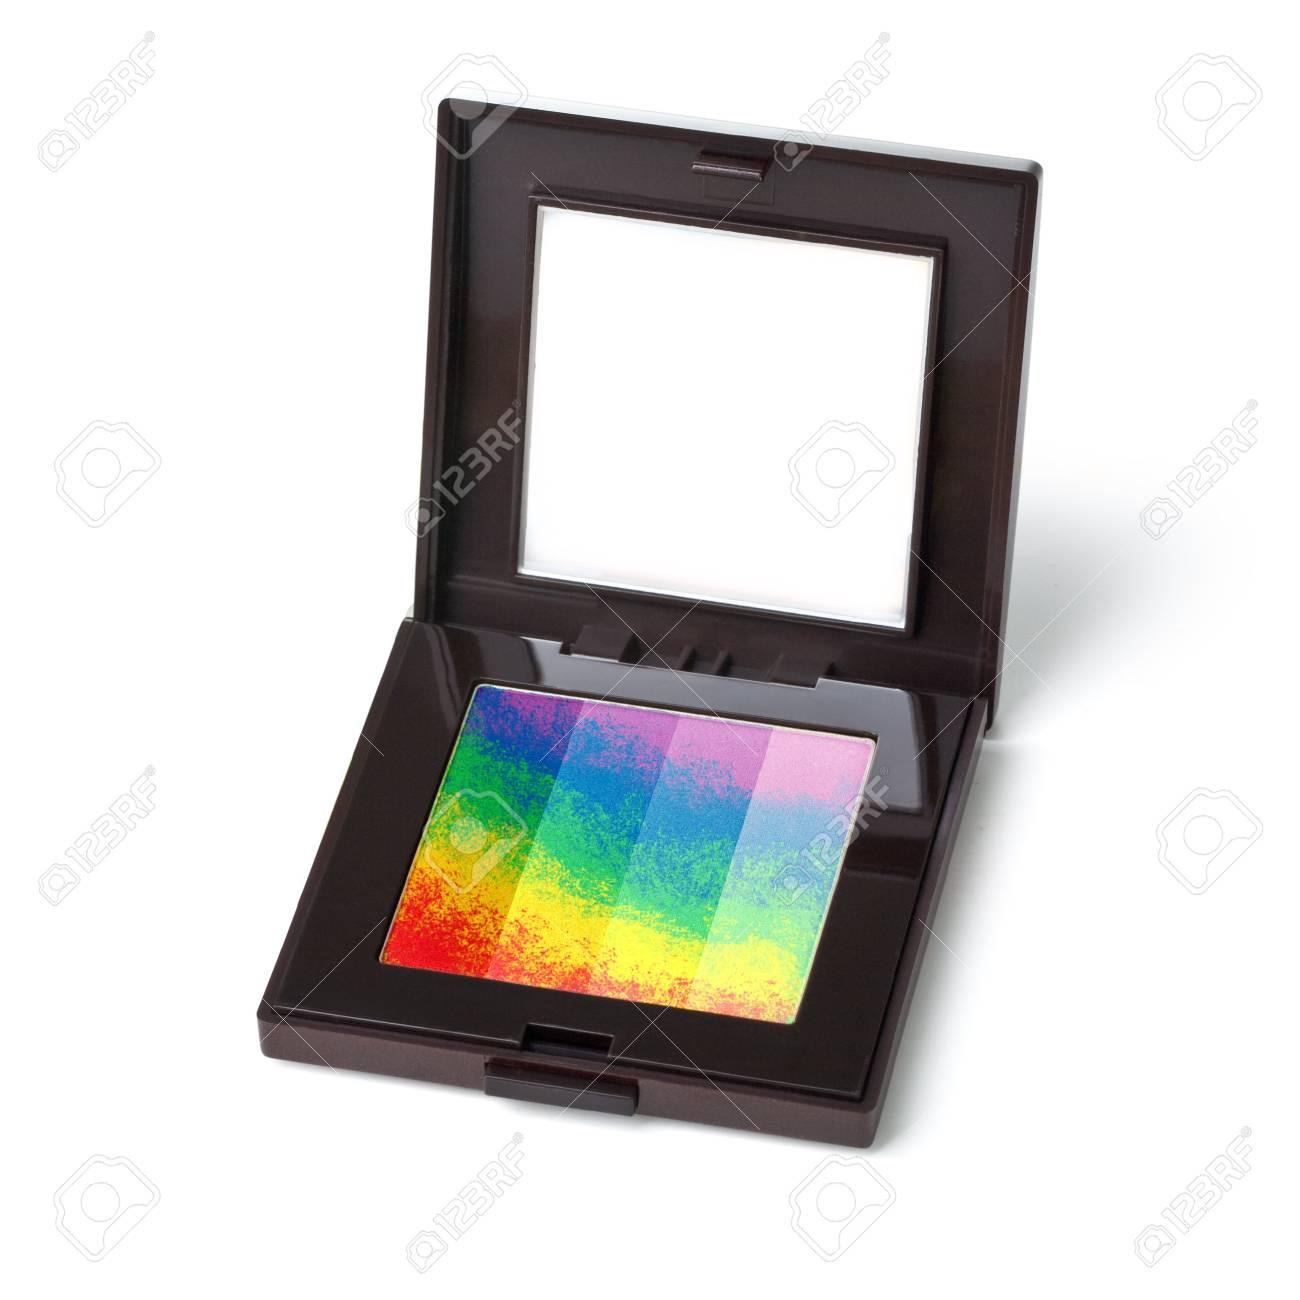 multicolored eye shadows isolated on white background Stock Photo - 18803802